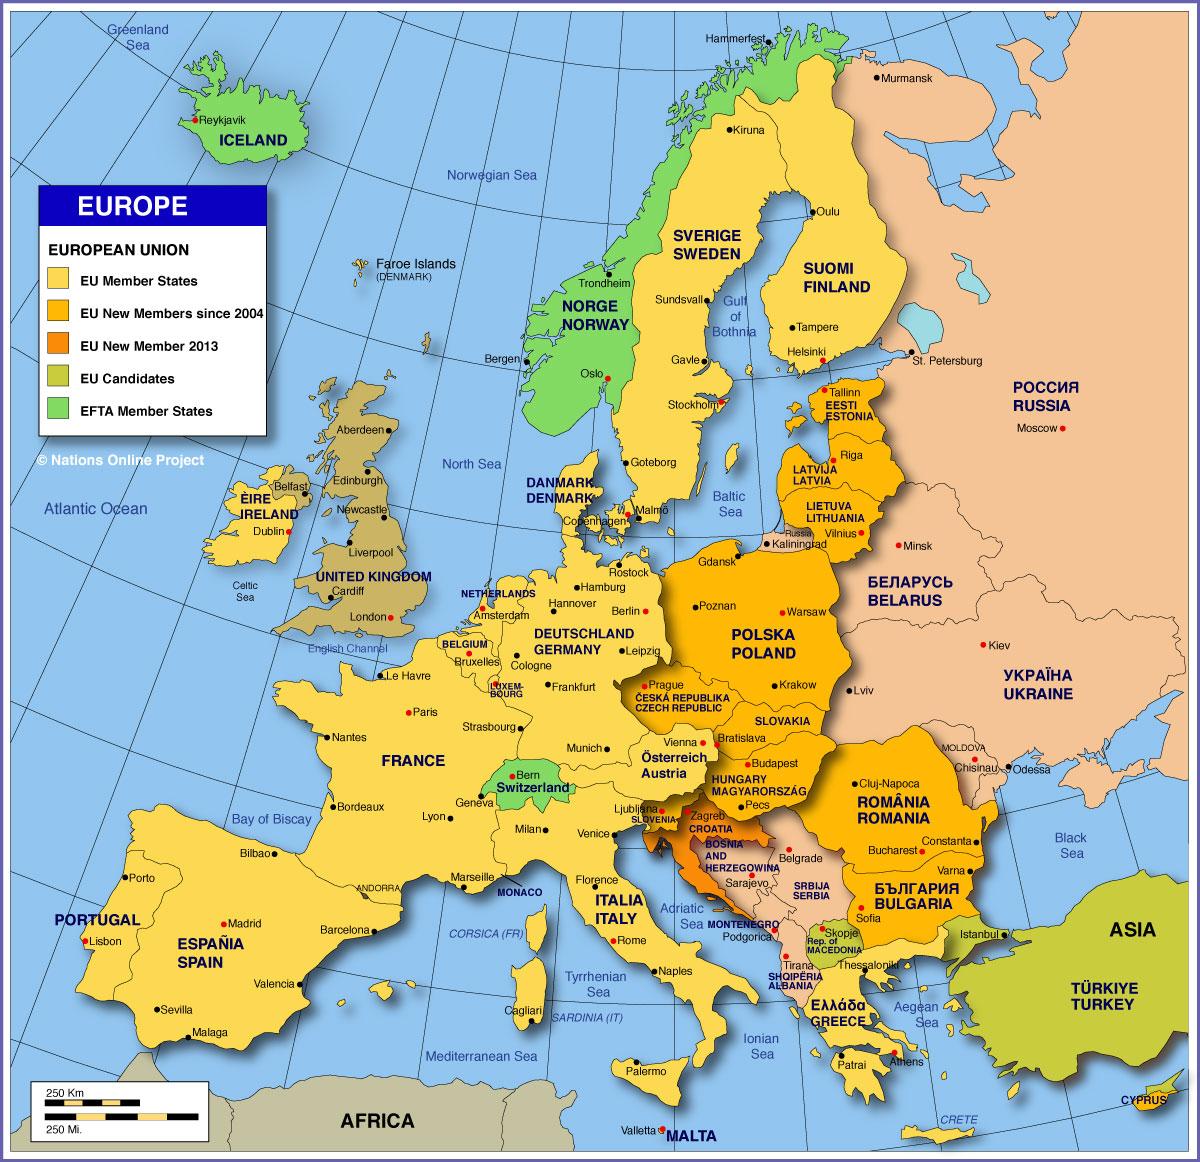 map of europe with eu countries Europa | EME 444: Global Energy Enterprise